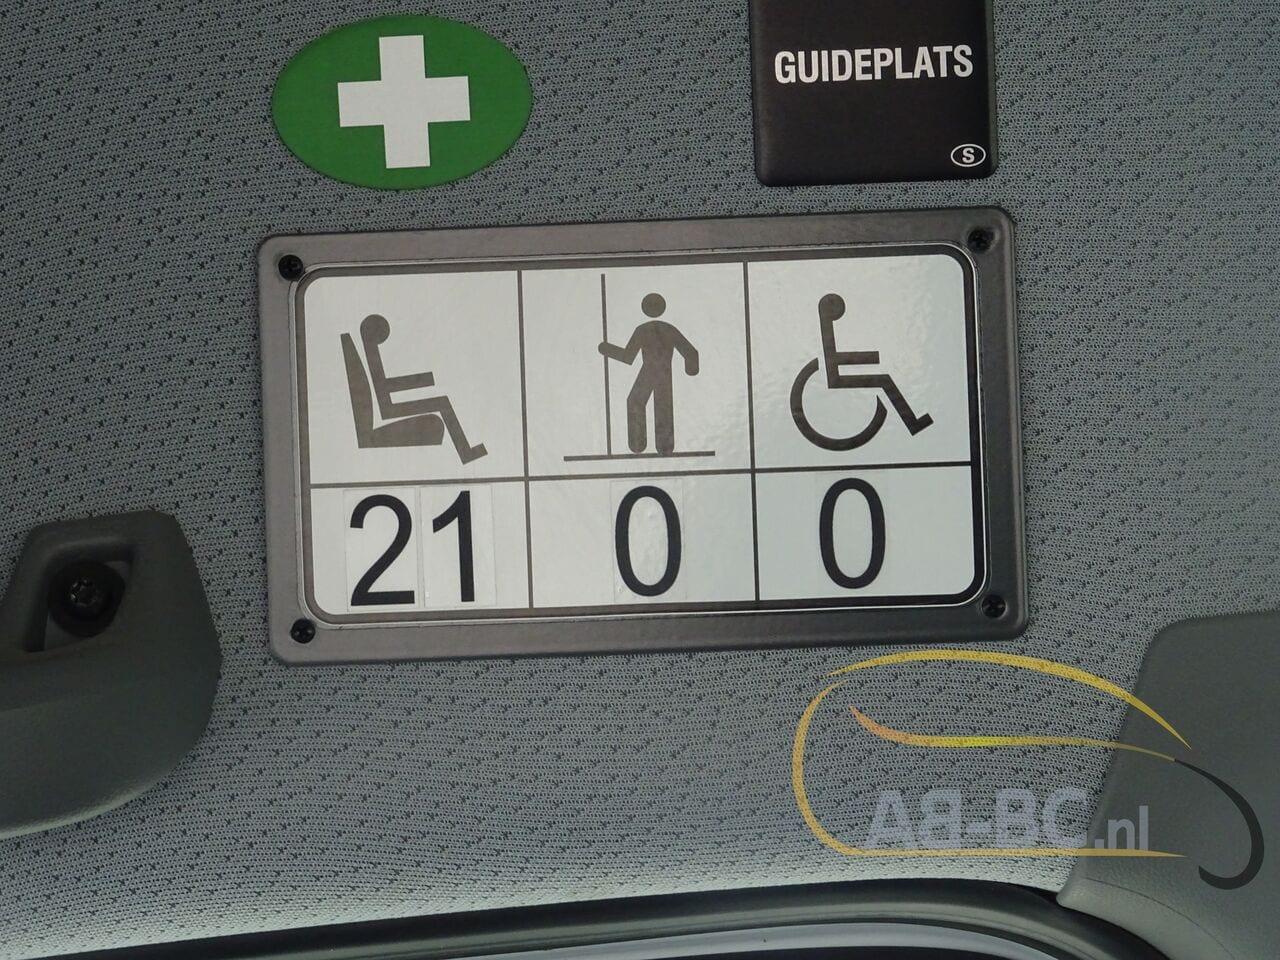 coach-busMERCEDES-BENZ-516-CDI-Sprinter-Transfer-45-23-Seats-EURO-6---1625235016660975141_big_14f6230dd8b801de5c174449a5777827--21060112394245379500